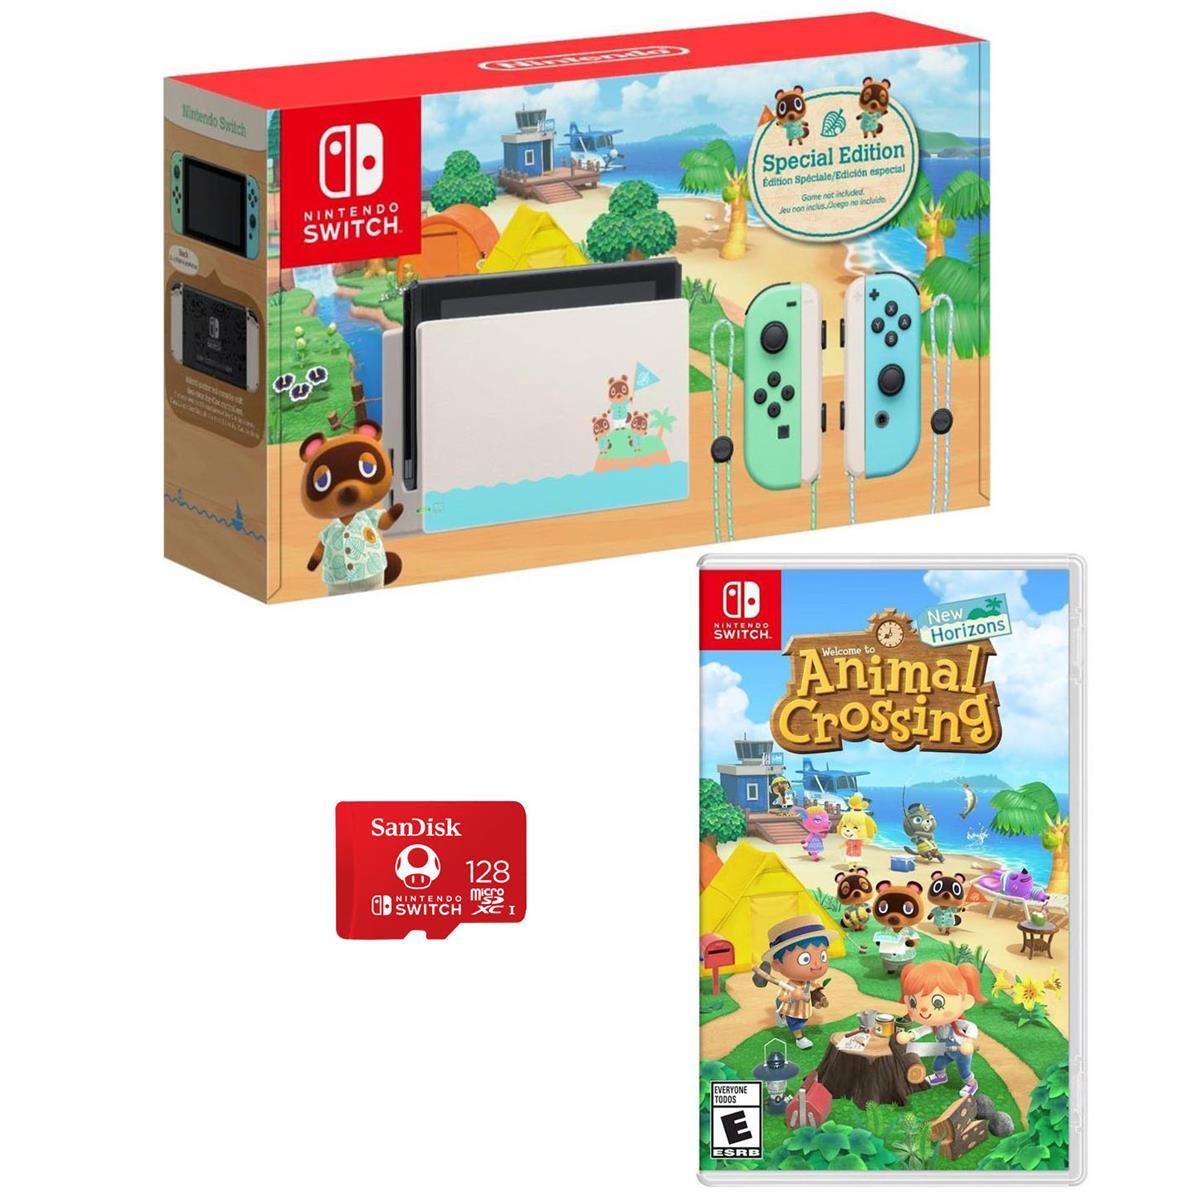 Nintendo - Switch 32GB Console - Animal Crossing: New Horizons Edition Bundle